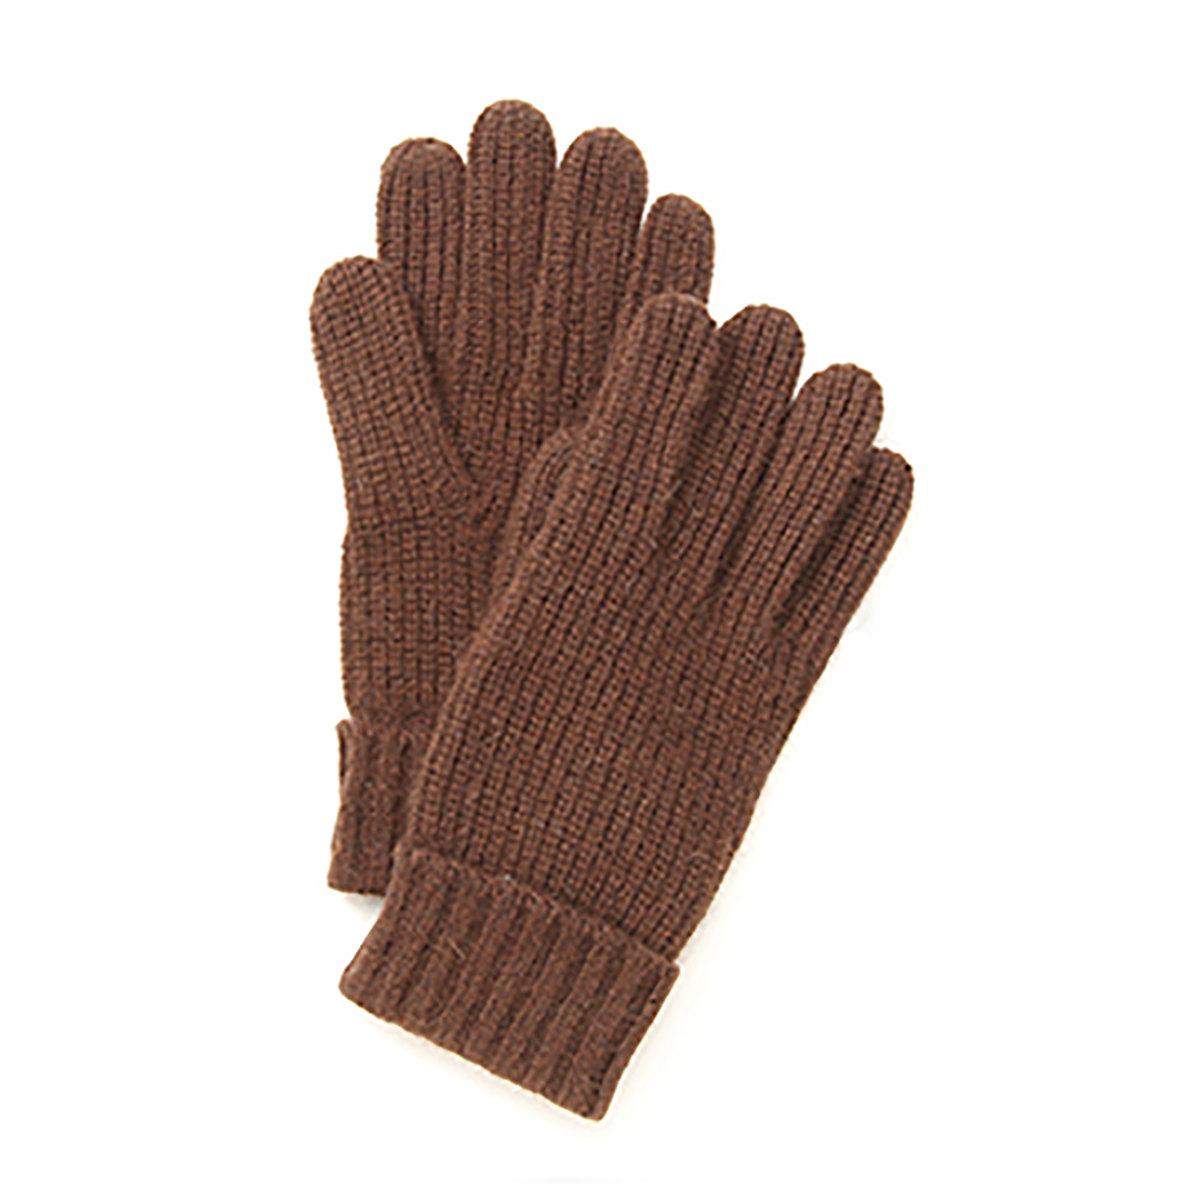 DAKS ロゴ刺繍入り ケーブル編みニット メンズ 手袋 日本製 フリーサイズ 全3色